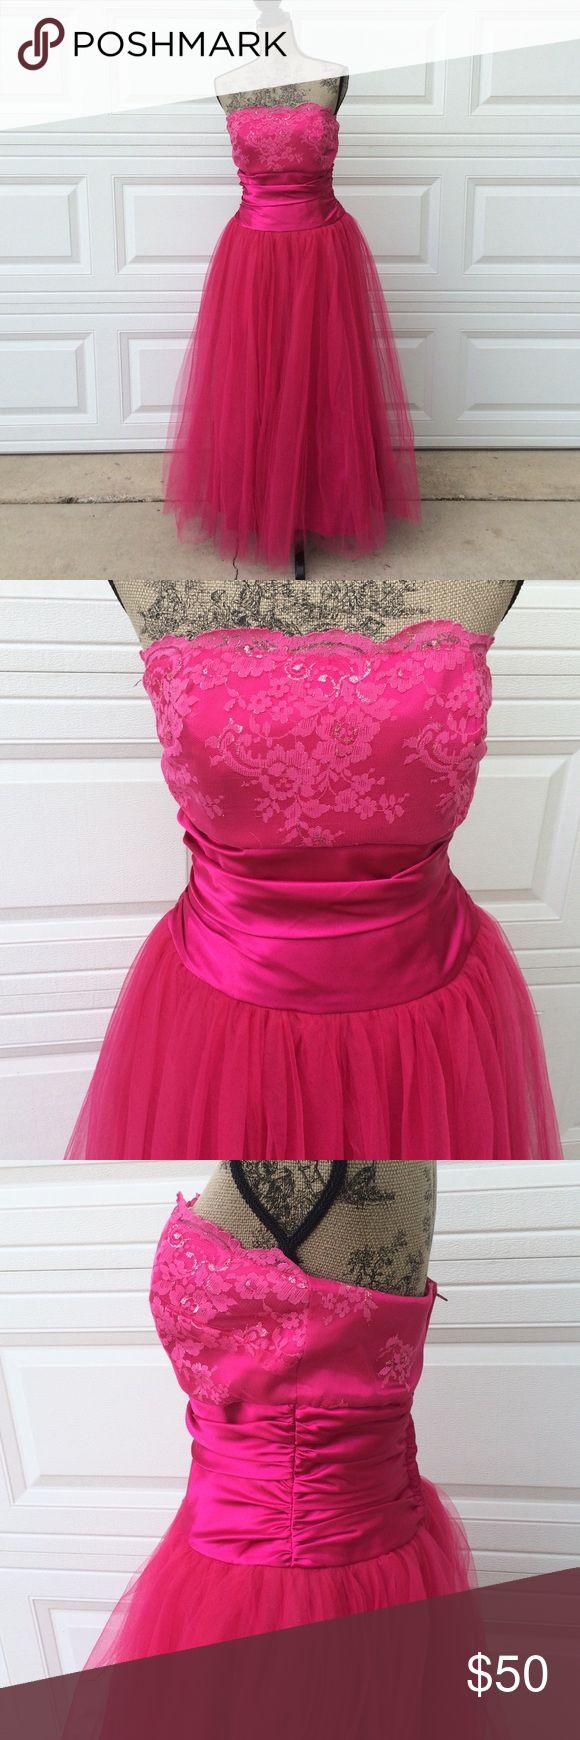 Excelente Vestidos De Baile De Jessica Mcclintock Festooning - Ideas ...